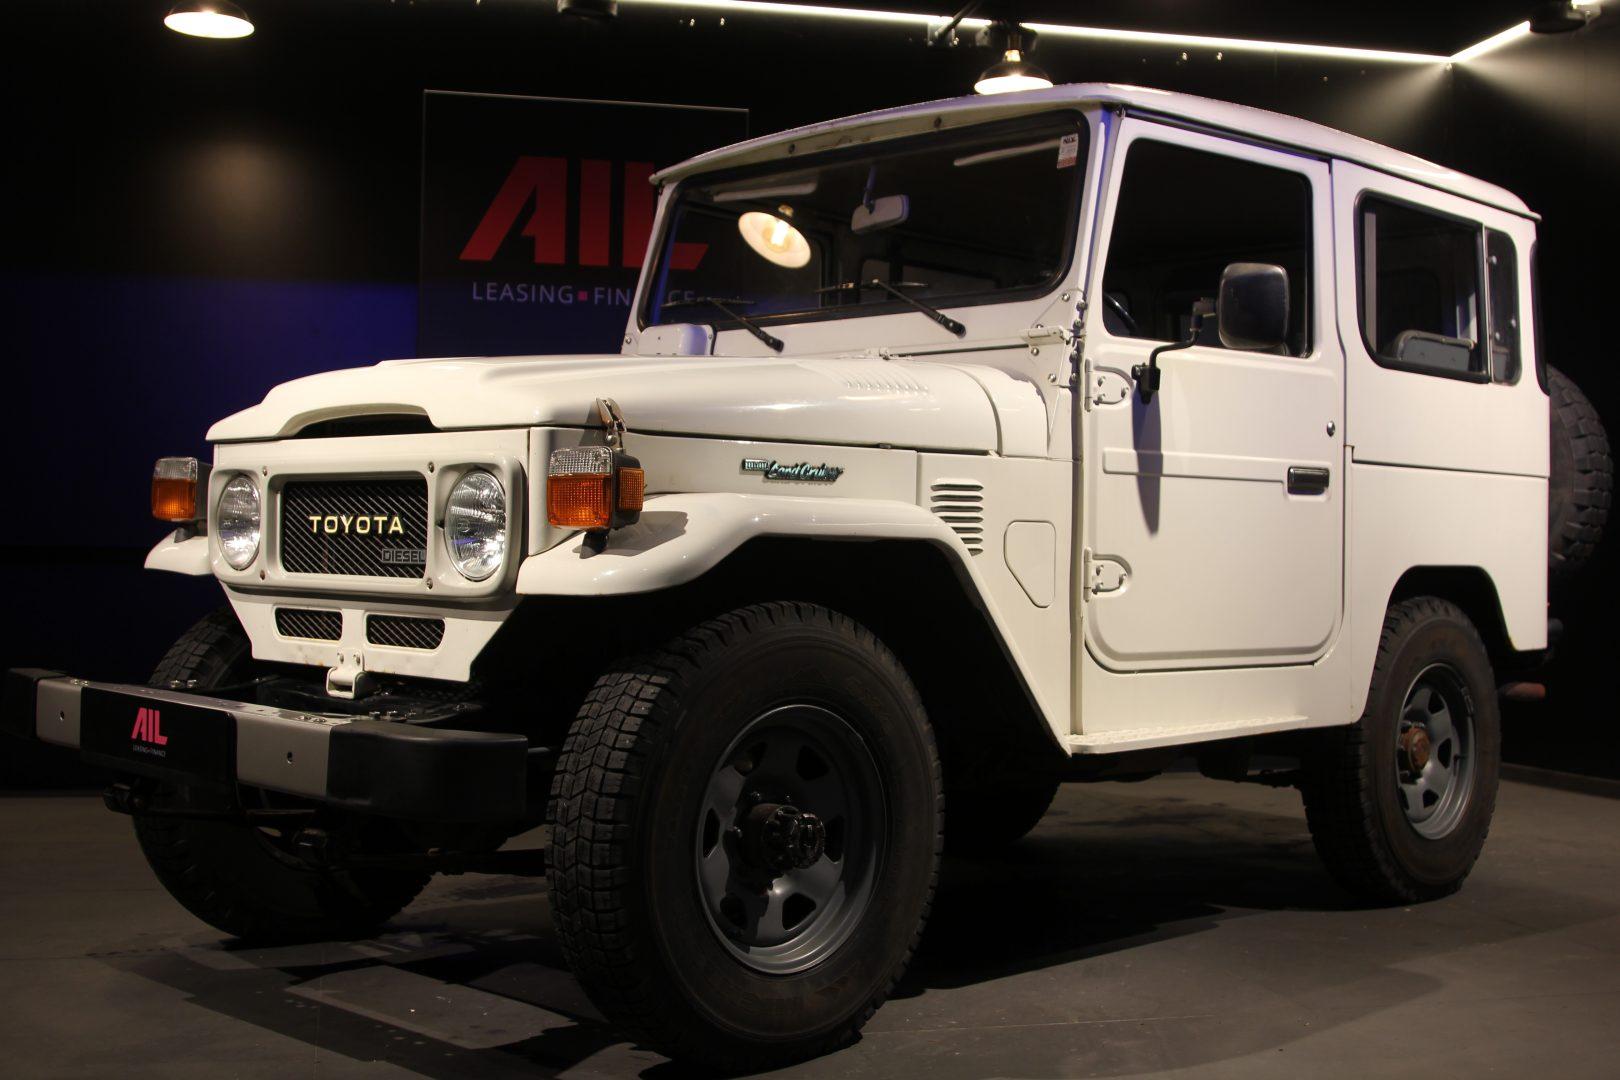 AIL Toyota Landcruiser  1